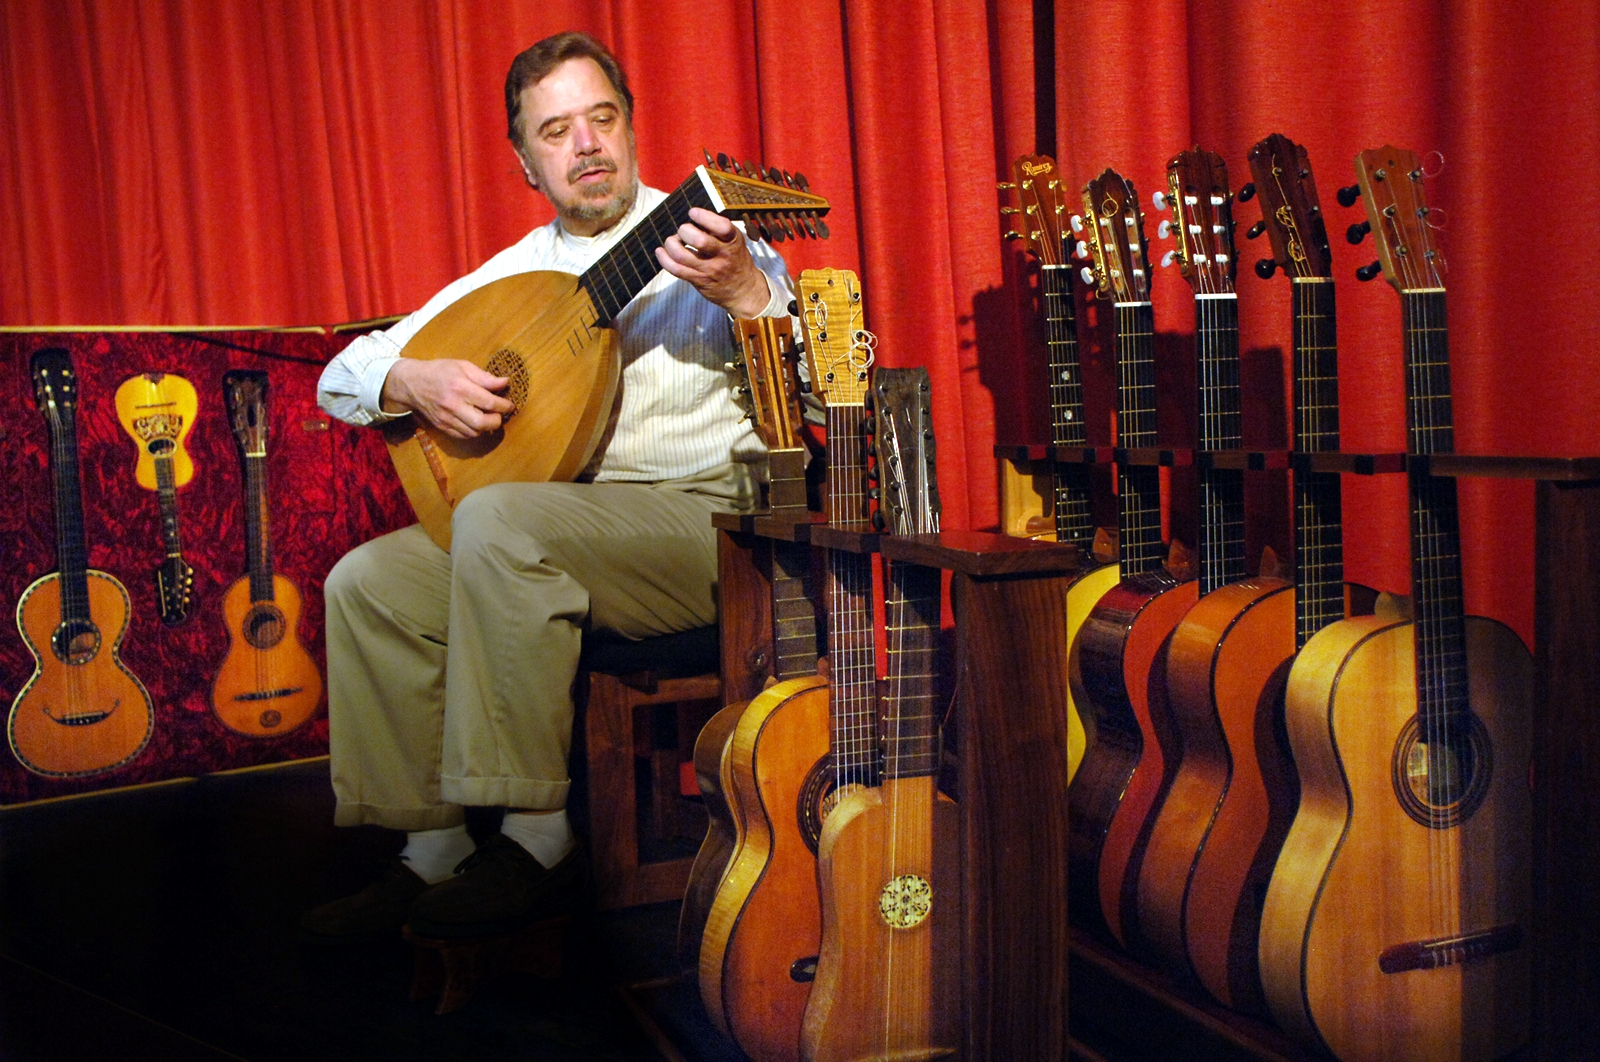 Randall Ferguson